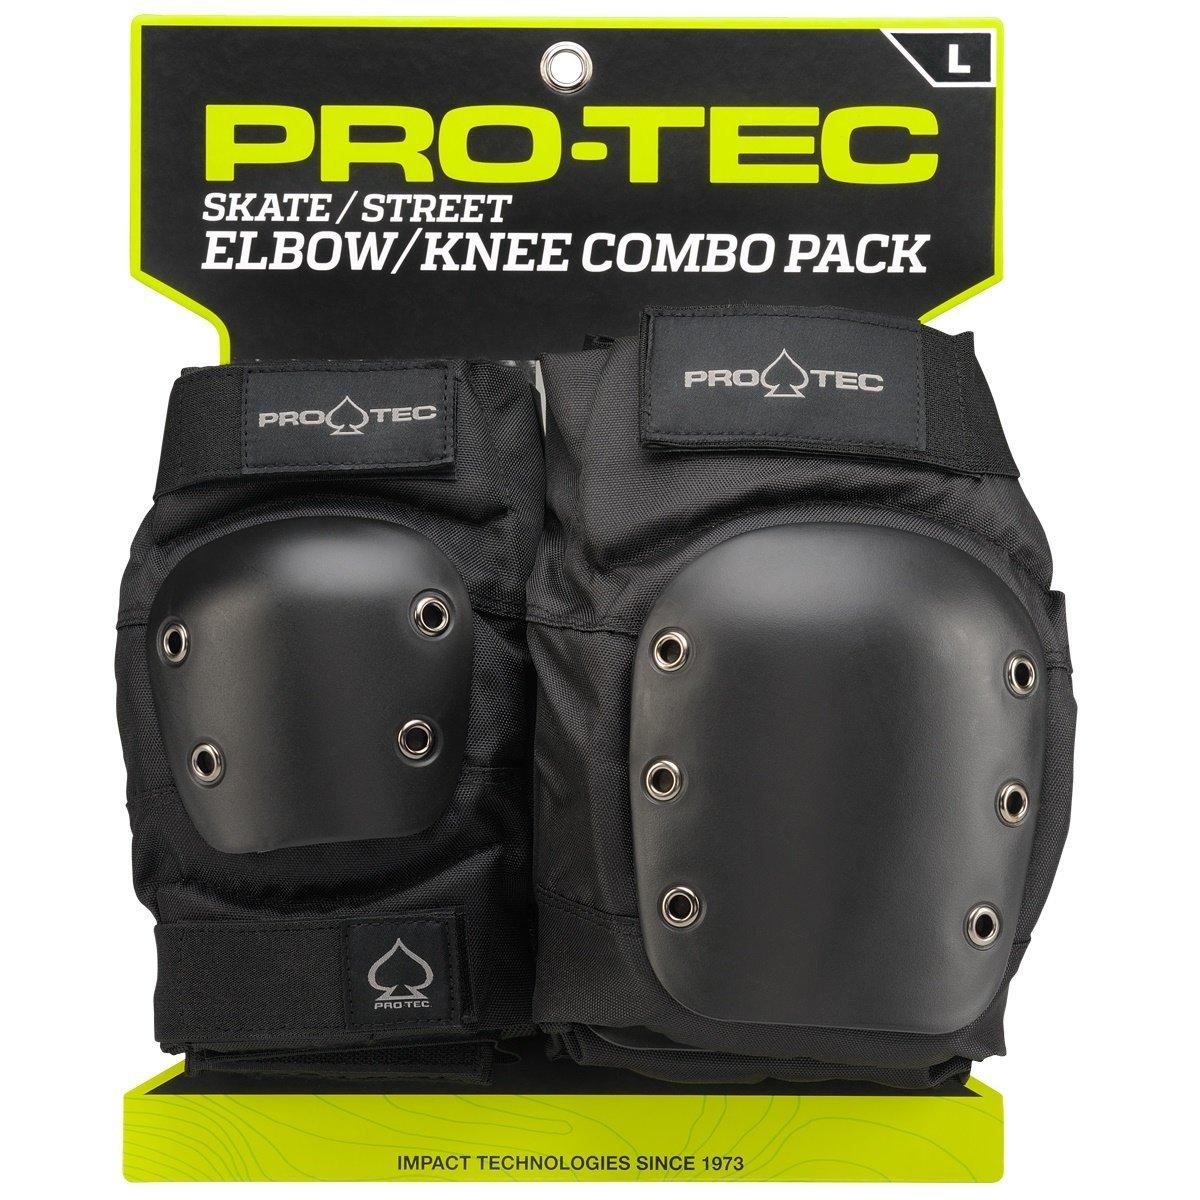 Pro-Tec Street Knee and Elbow Pad Set, Set of professiona...